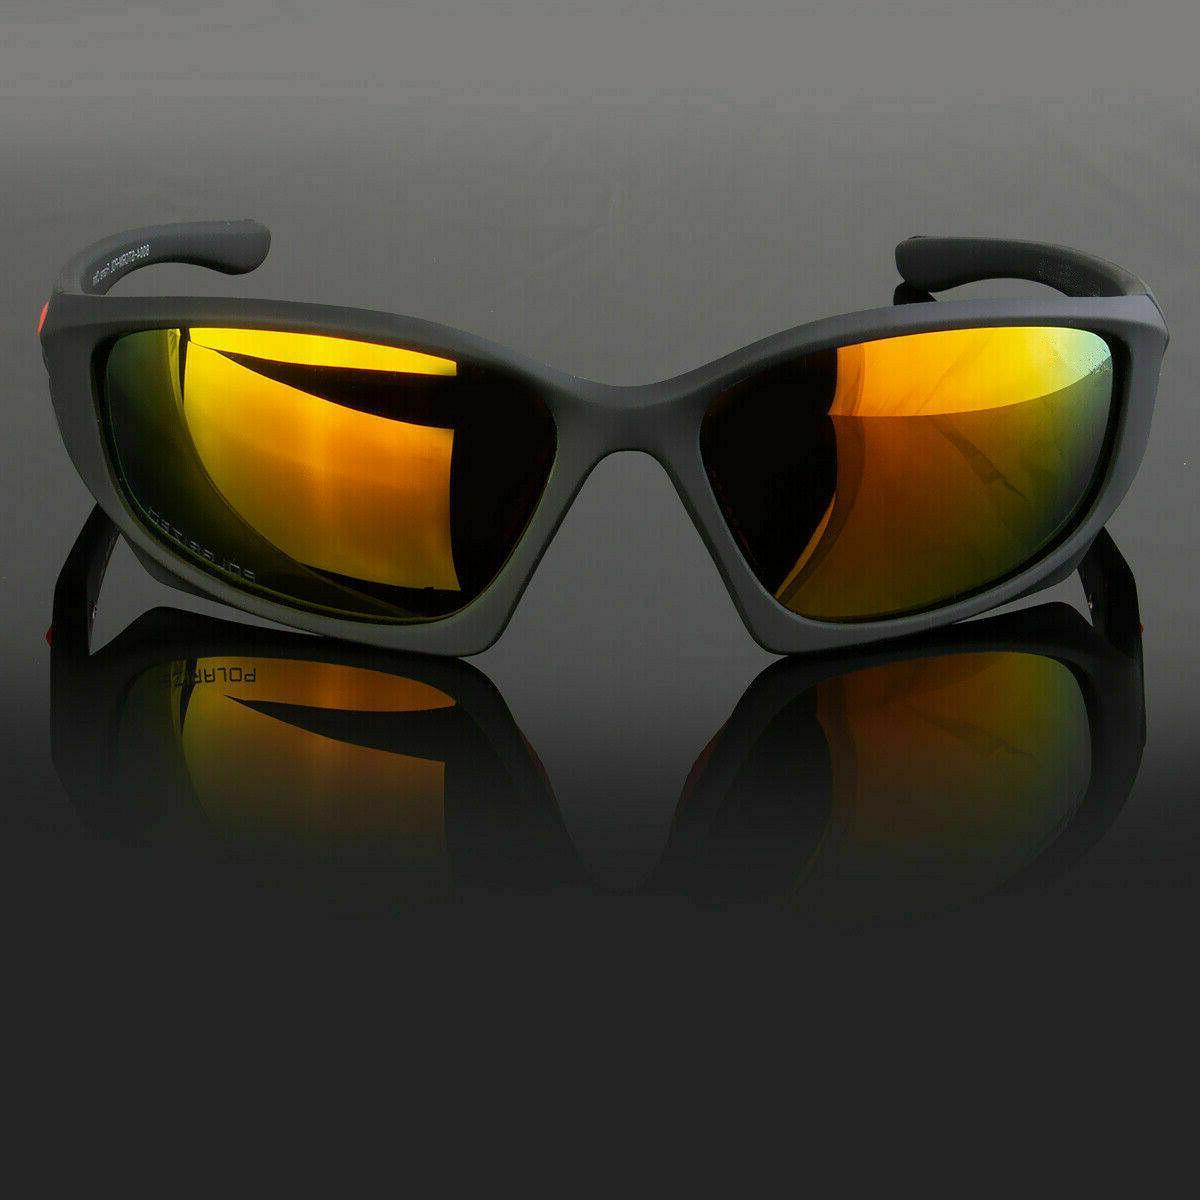 New Polarized Outdoor Eyewear Driving Around